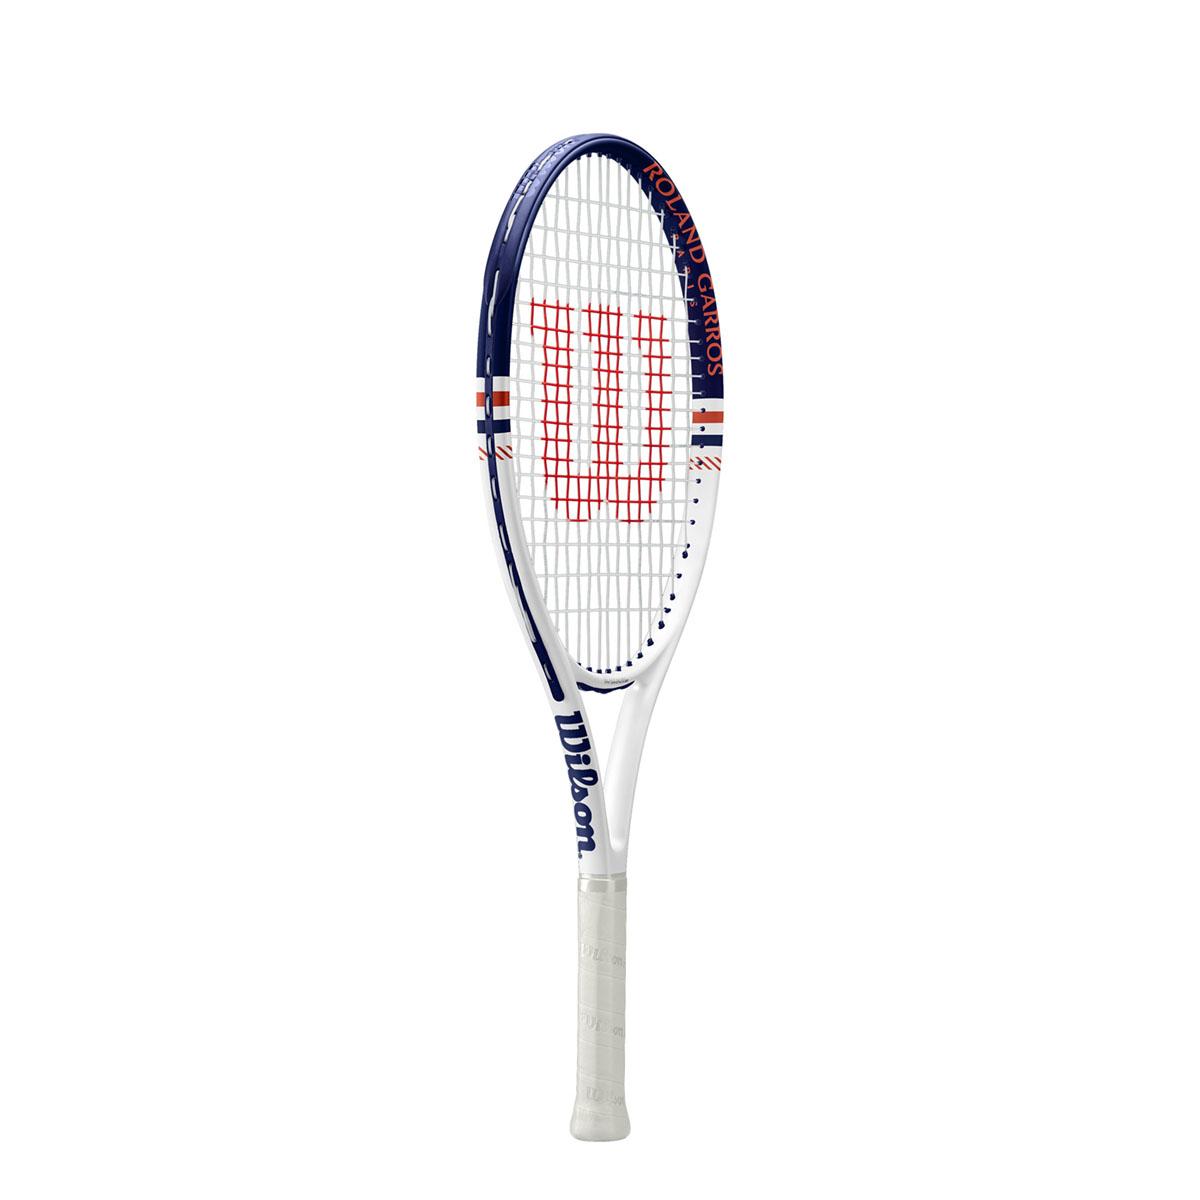 WR070210H_1_Roland_Garros_Elite_Competition_JR_BU_OR_WH.png.cq5dam.web.2000.2000